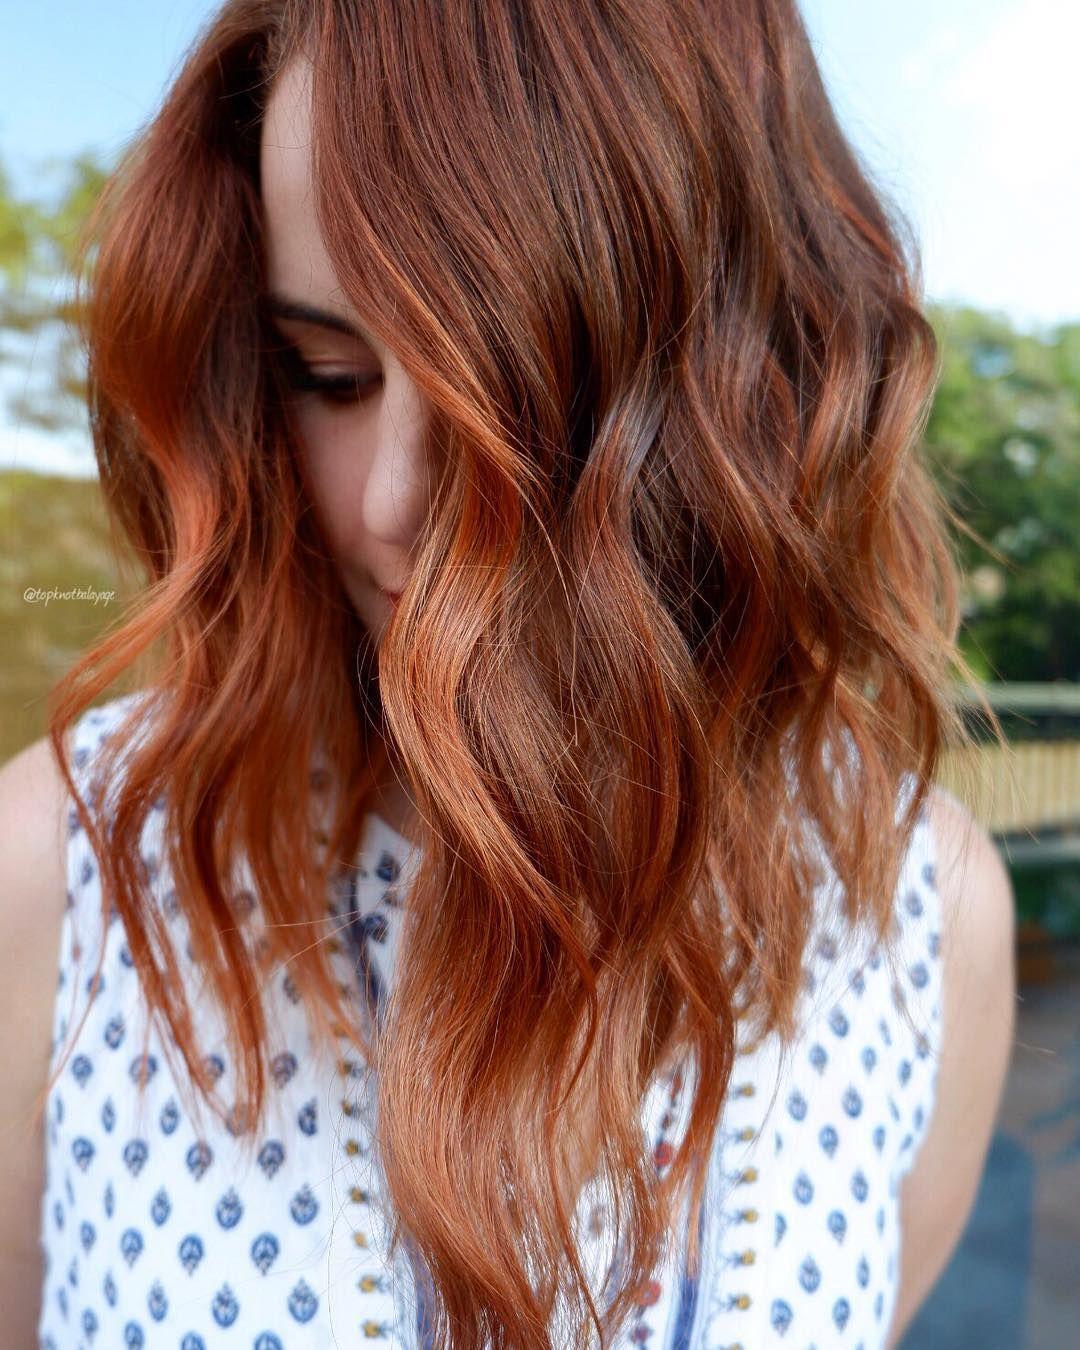 This Stunning Pumpkin Spice Hair Look By Amanda Leaman Is All